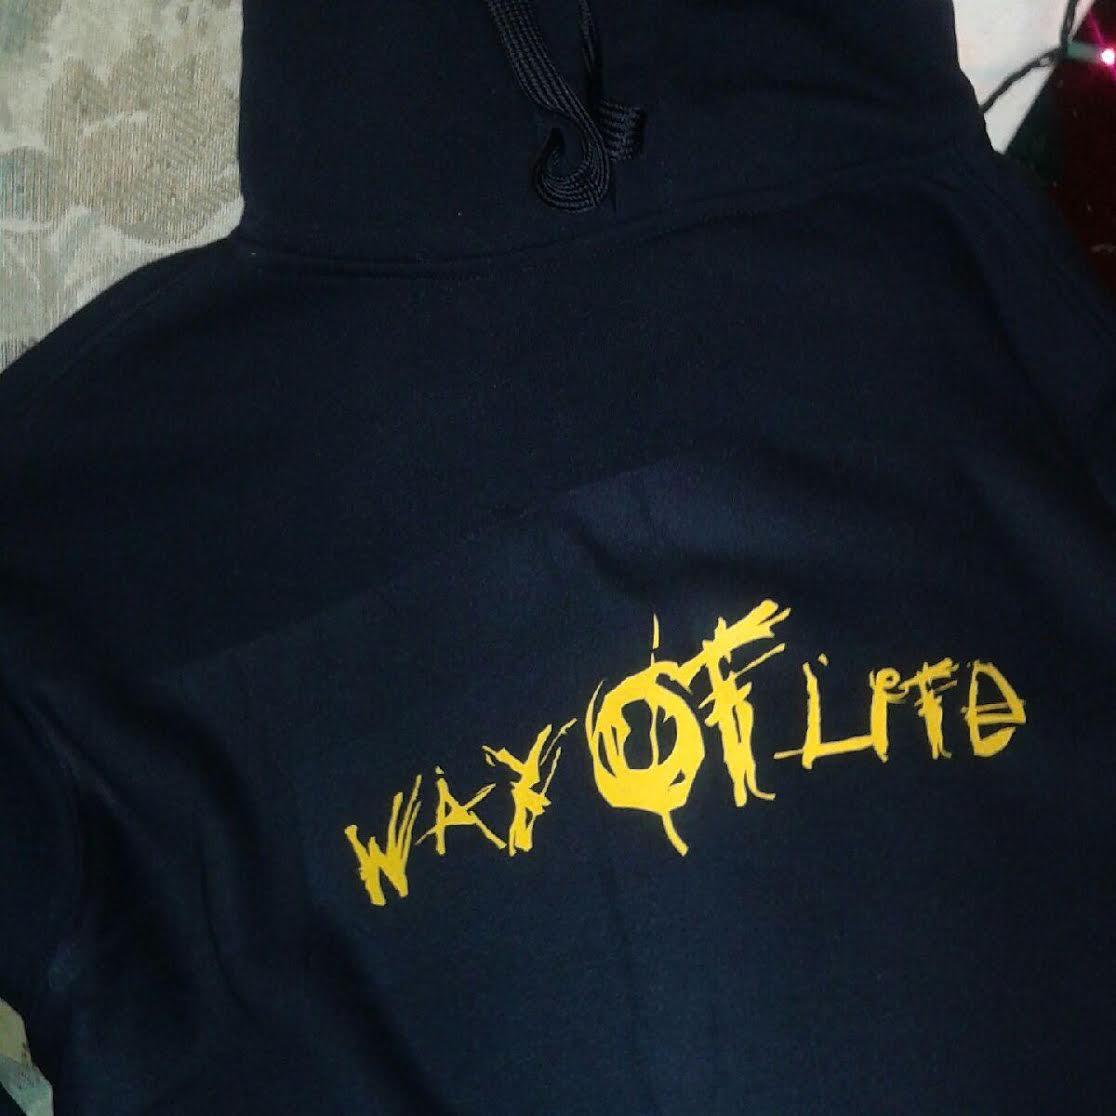 way-of-life-band-apparel-3